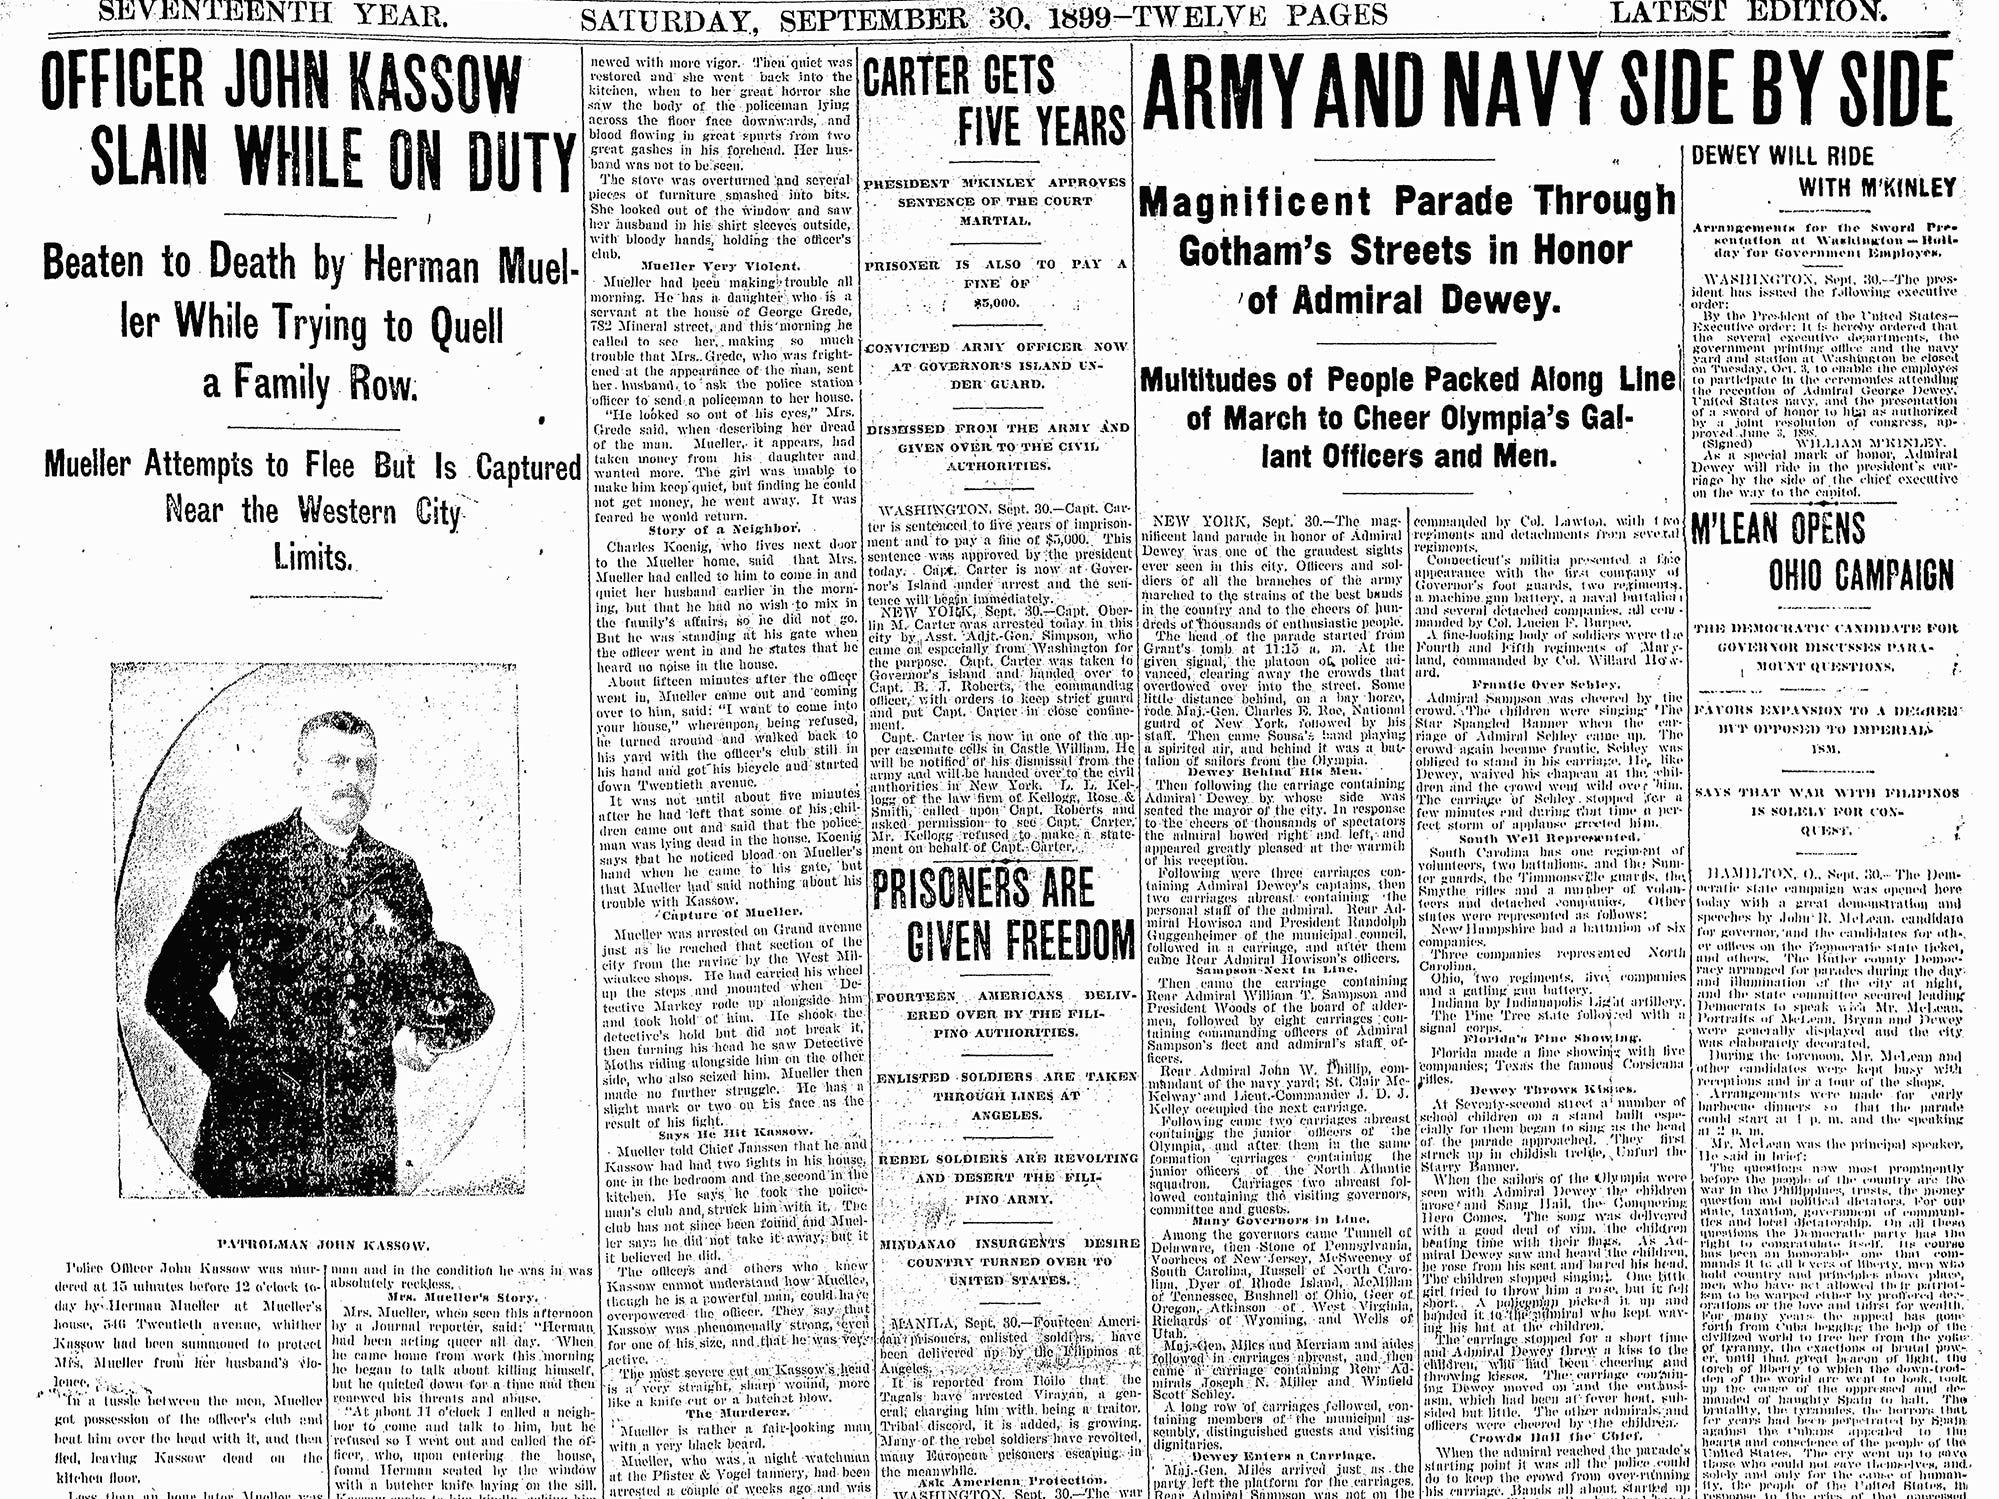 John Kassow Start of duty: March 1, 1890 End of watch: September 30, 1899